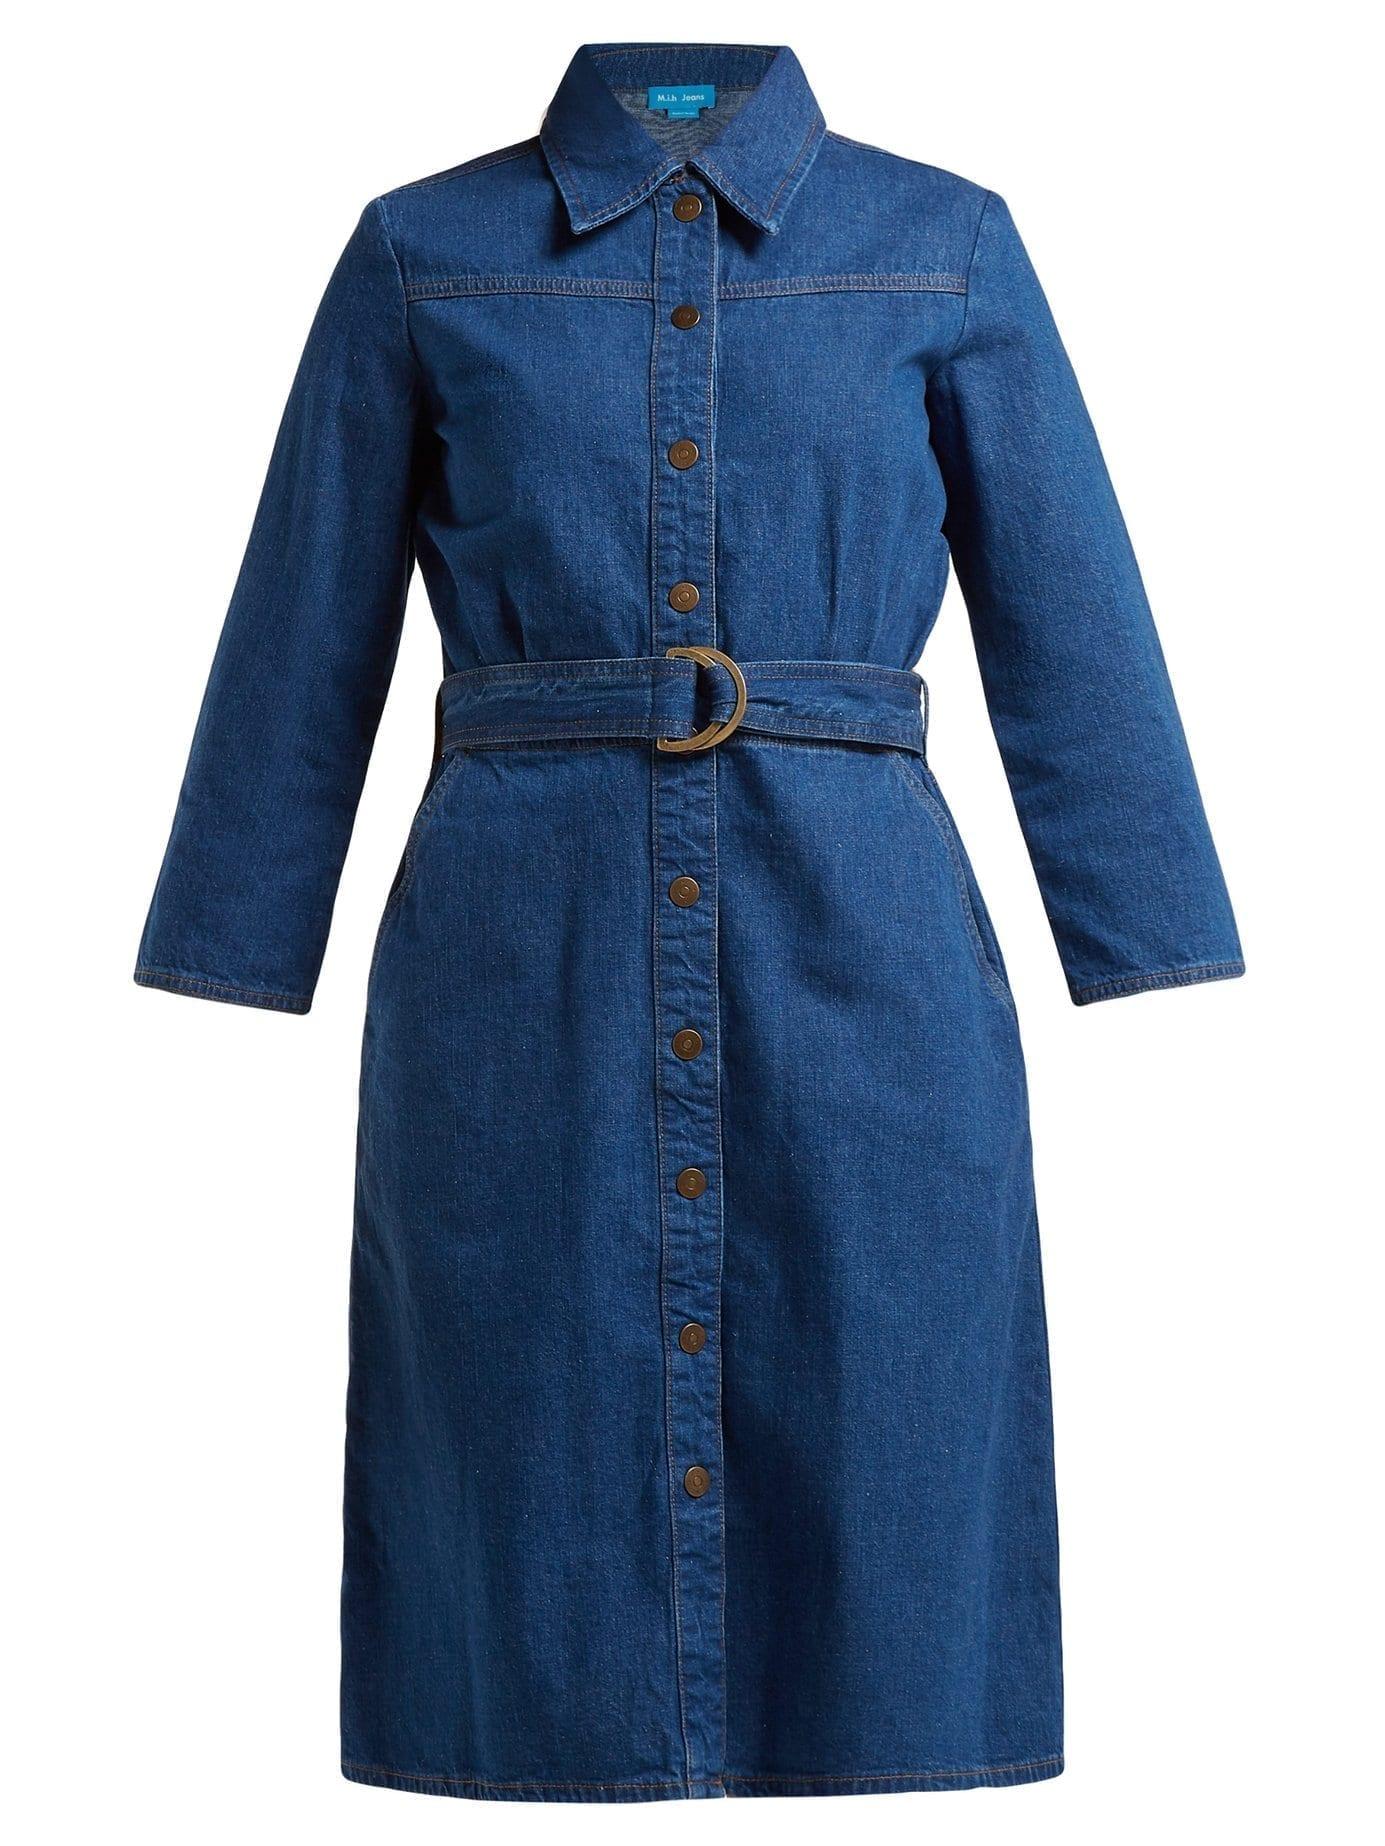 9d6cecc0a05 M.I.H JEANS Aria Denim Shirt Blue Dress - We Select Dresses